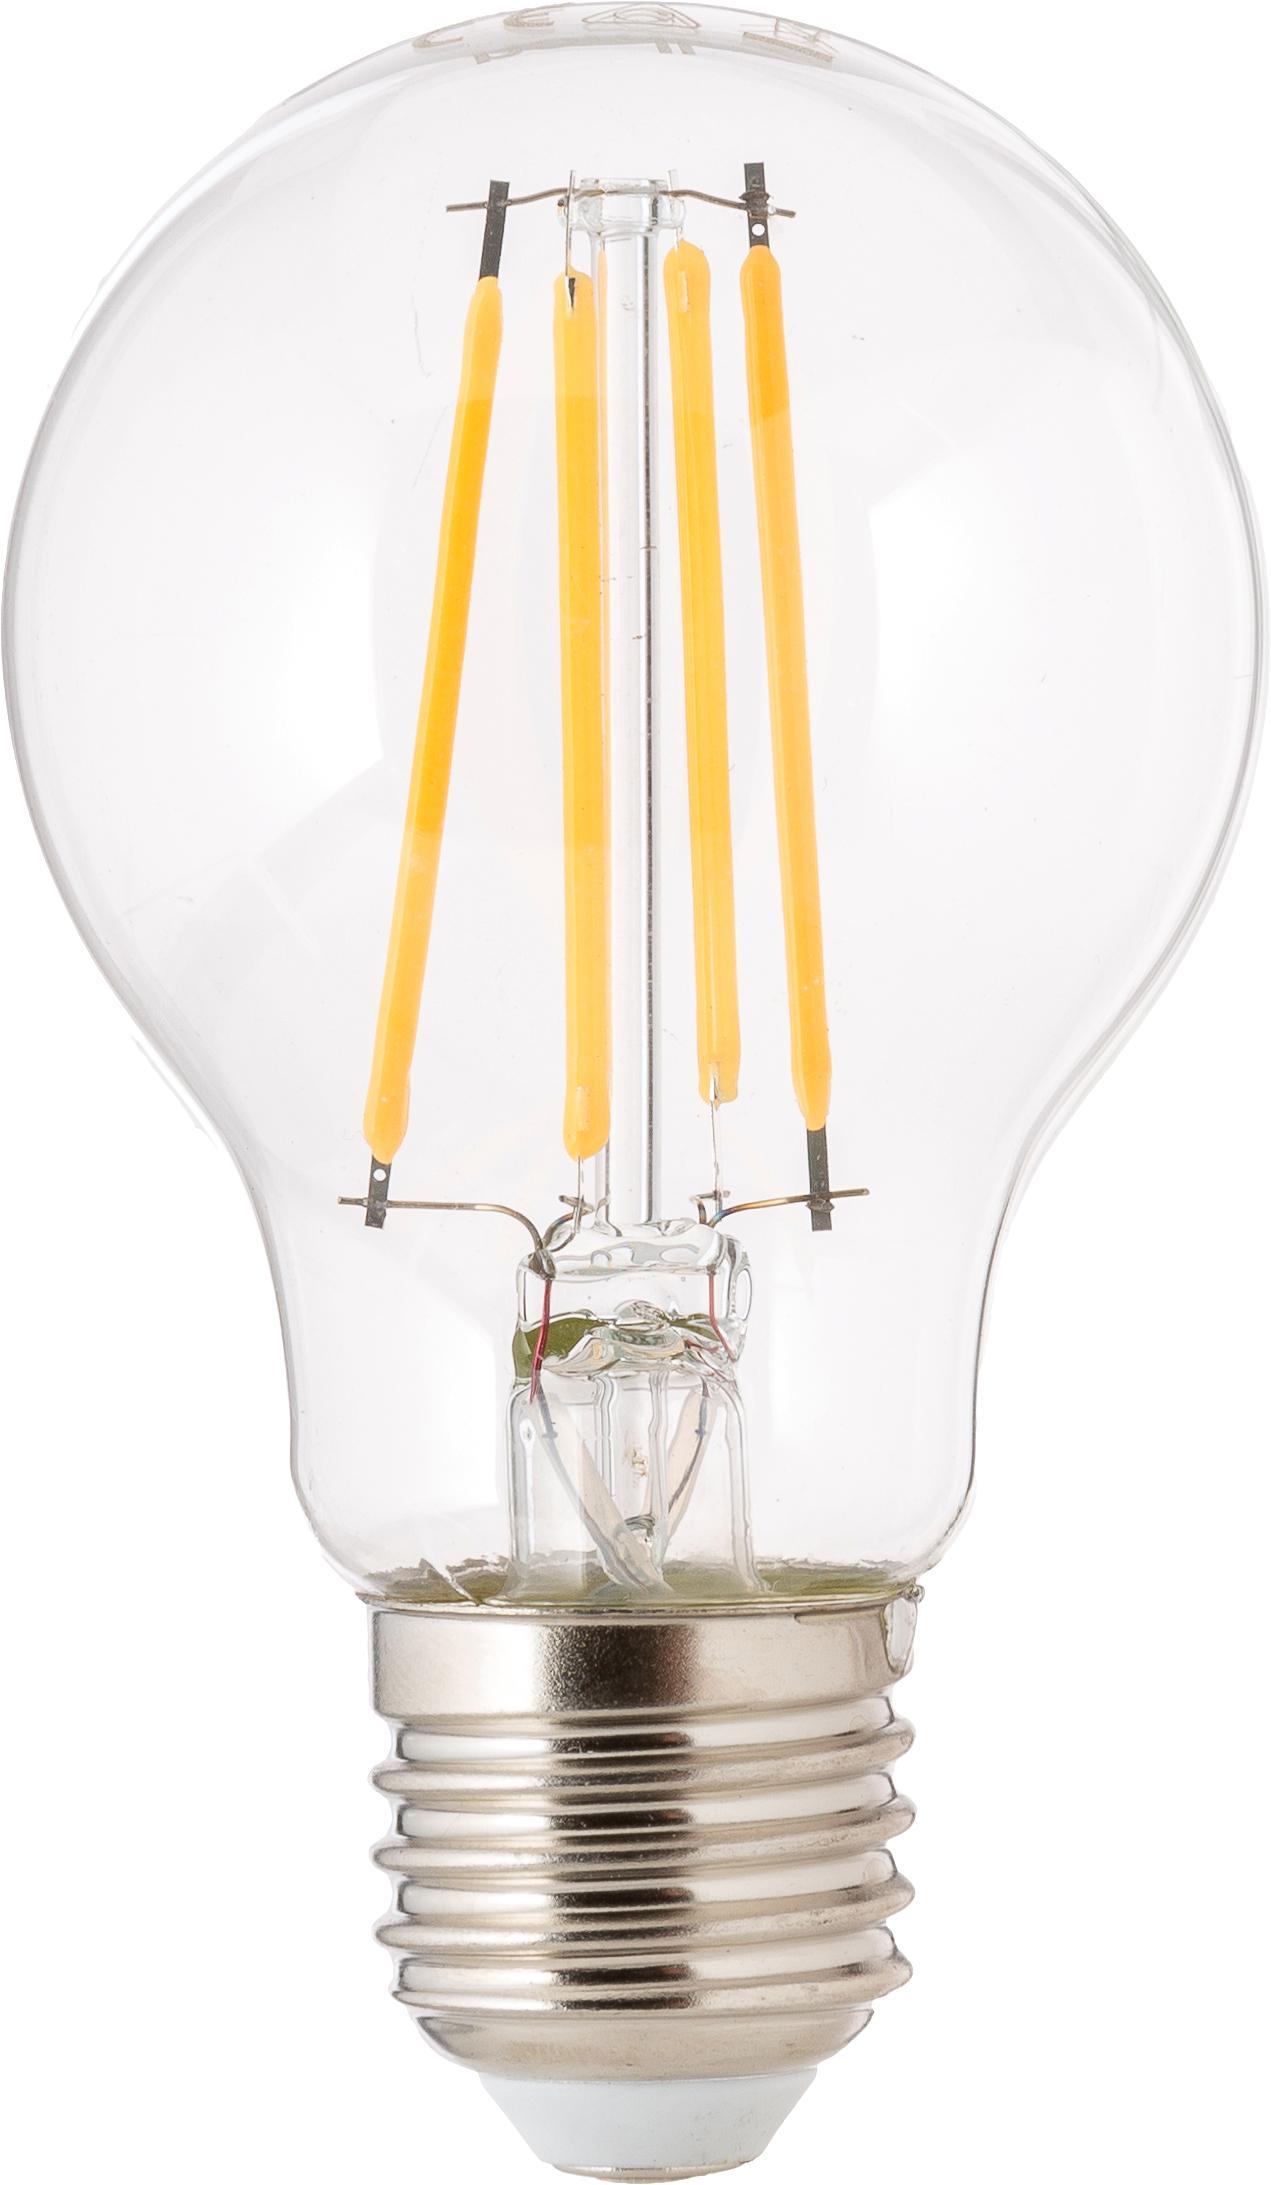 Lampadina dimmerabile Cherub (E27 / 8,3Watt) 3 pz, Lampadina: vetro, Trasparente, Ø 8 x Alt. 10 cm